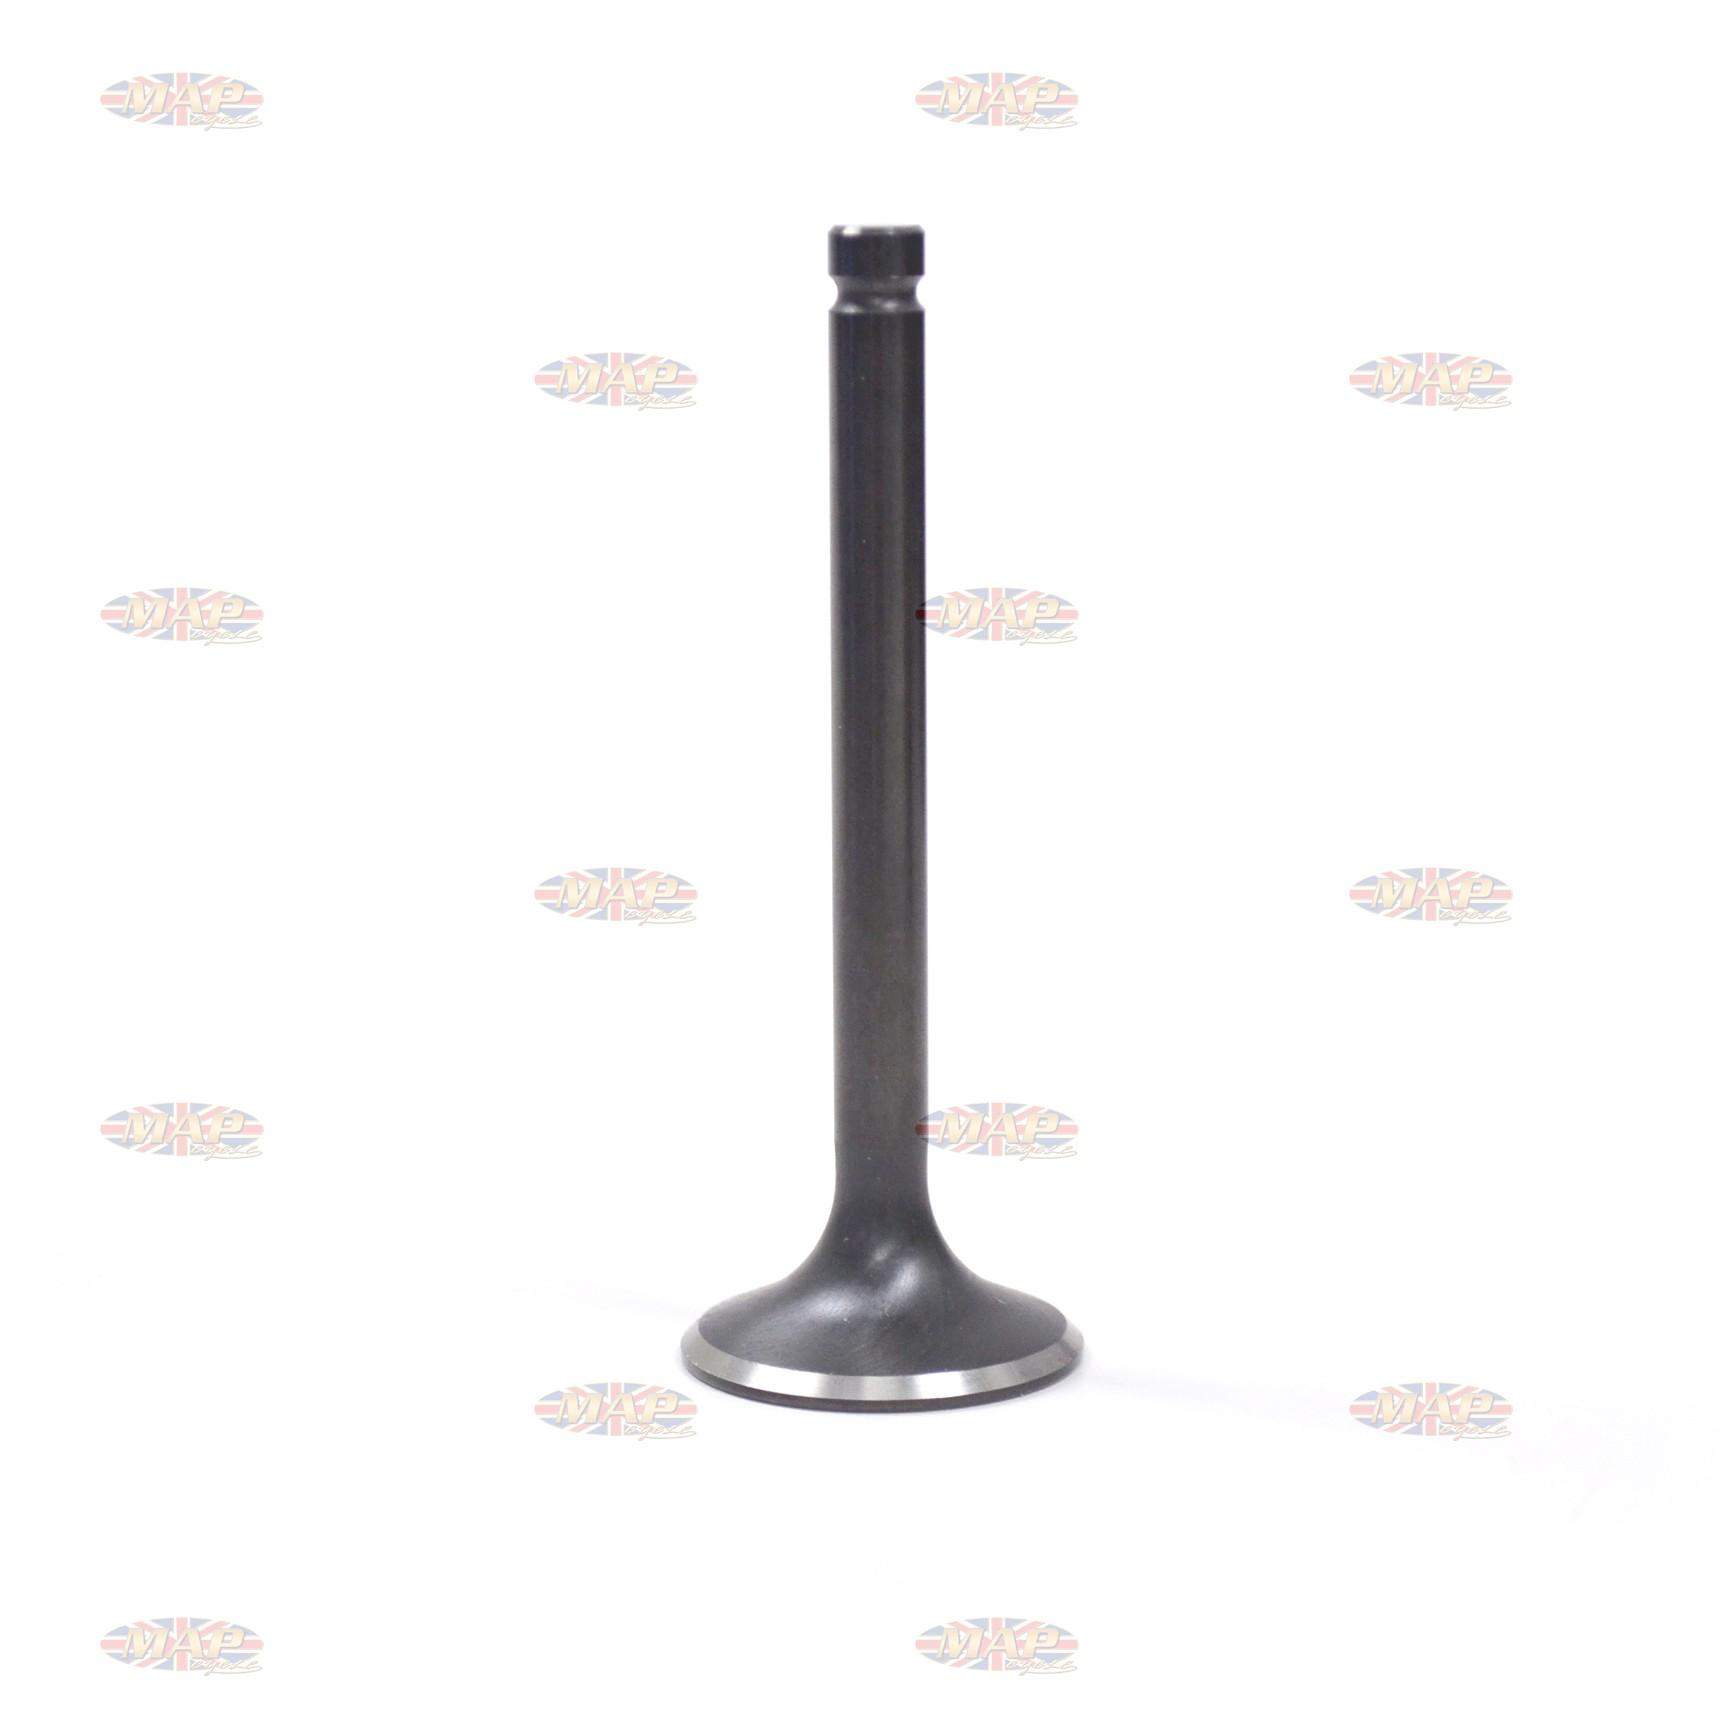 BSA A50 B25 Black Diamond Standard Sized Exhaust Valve 68-0662/BD